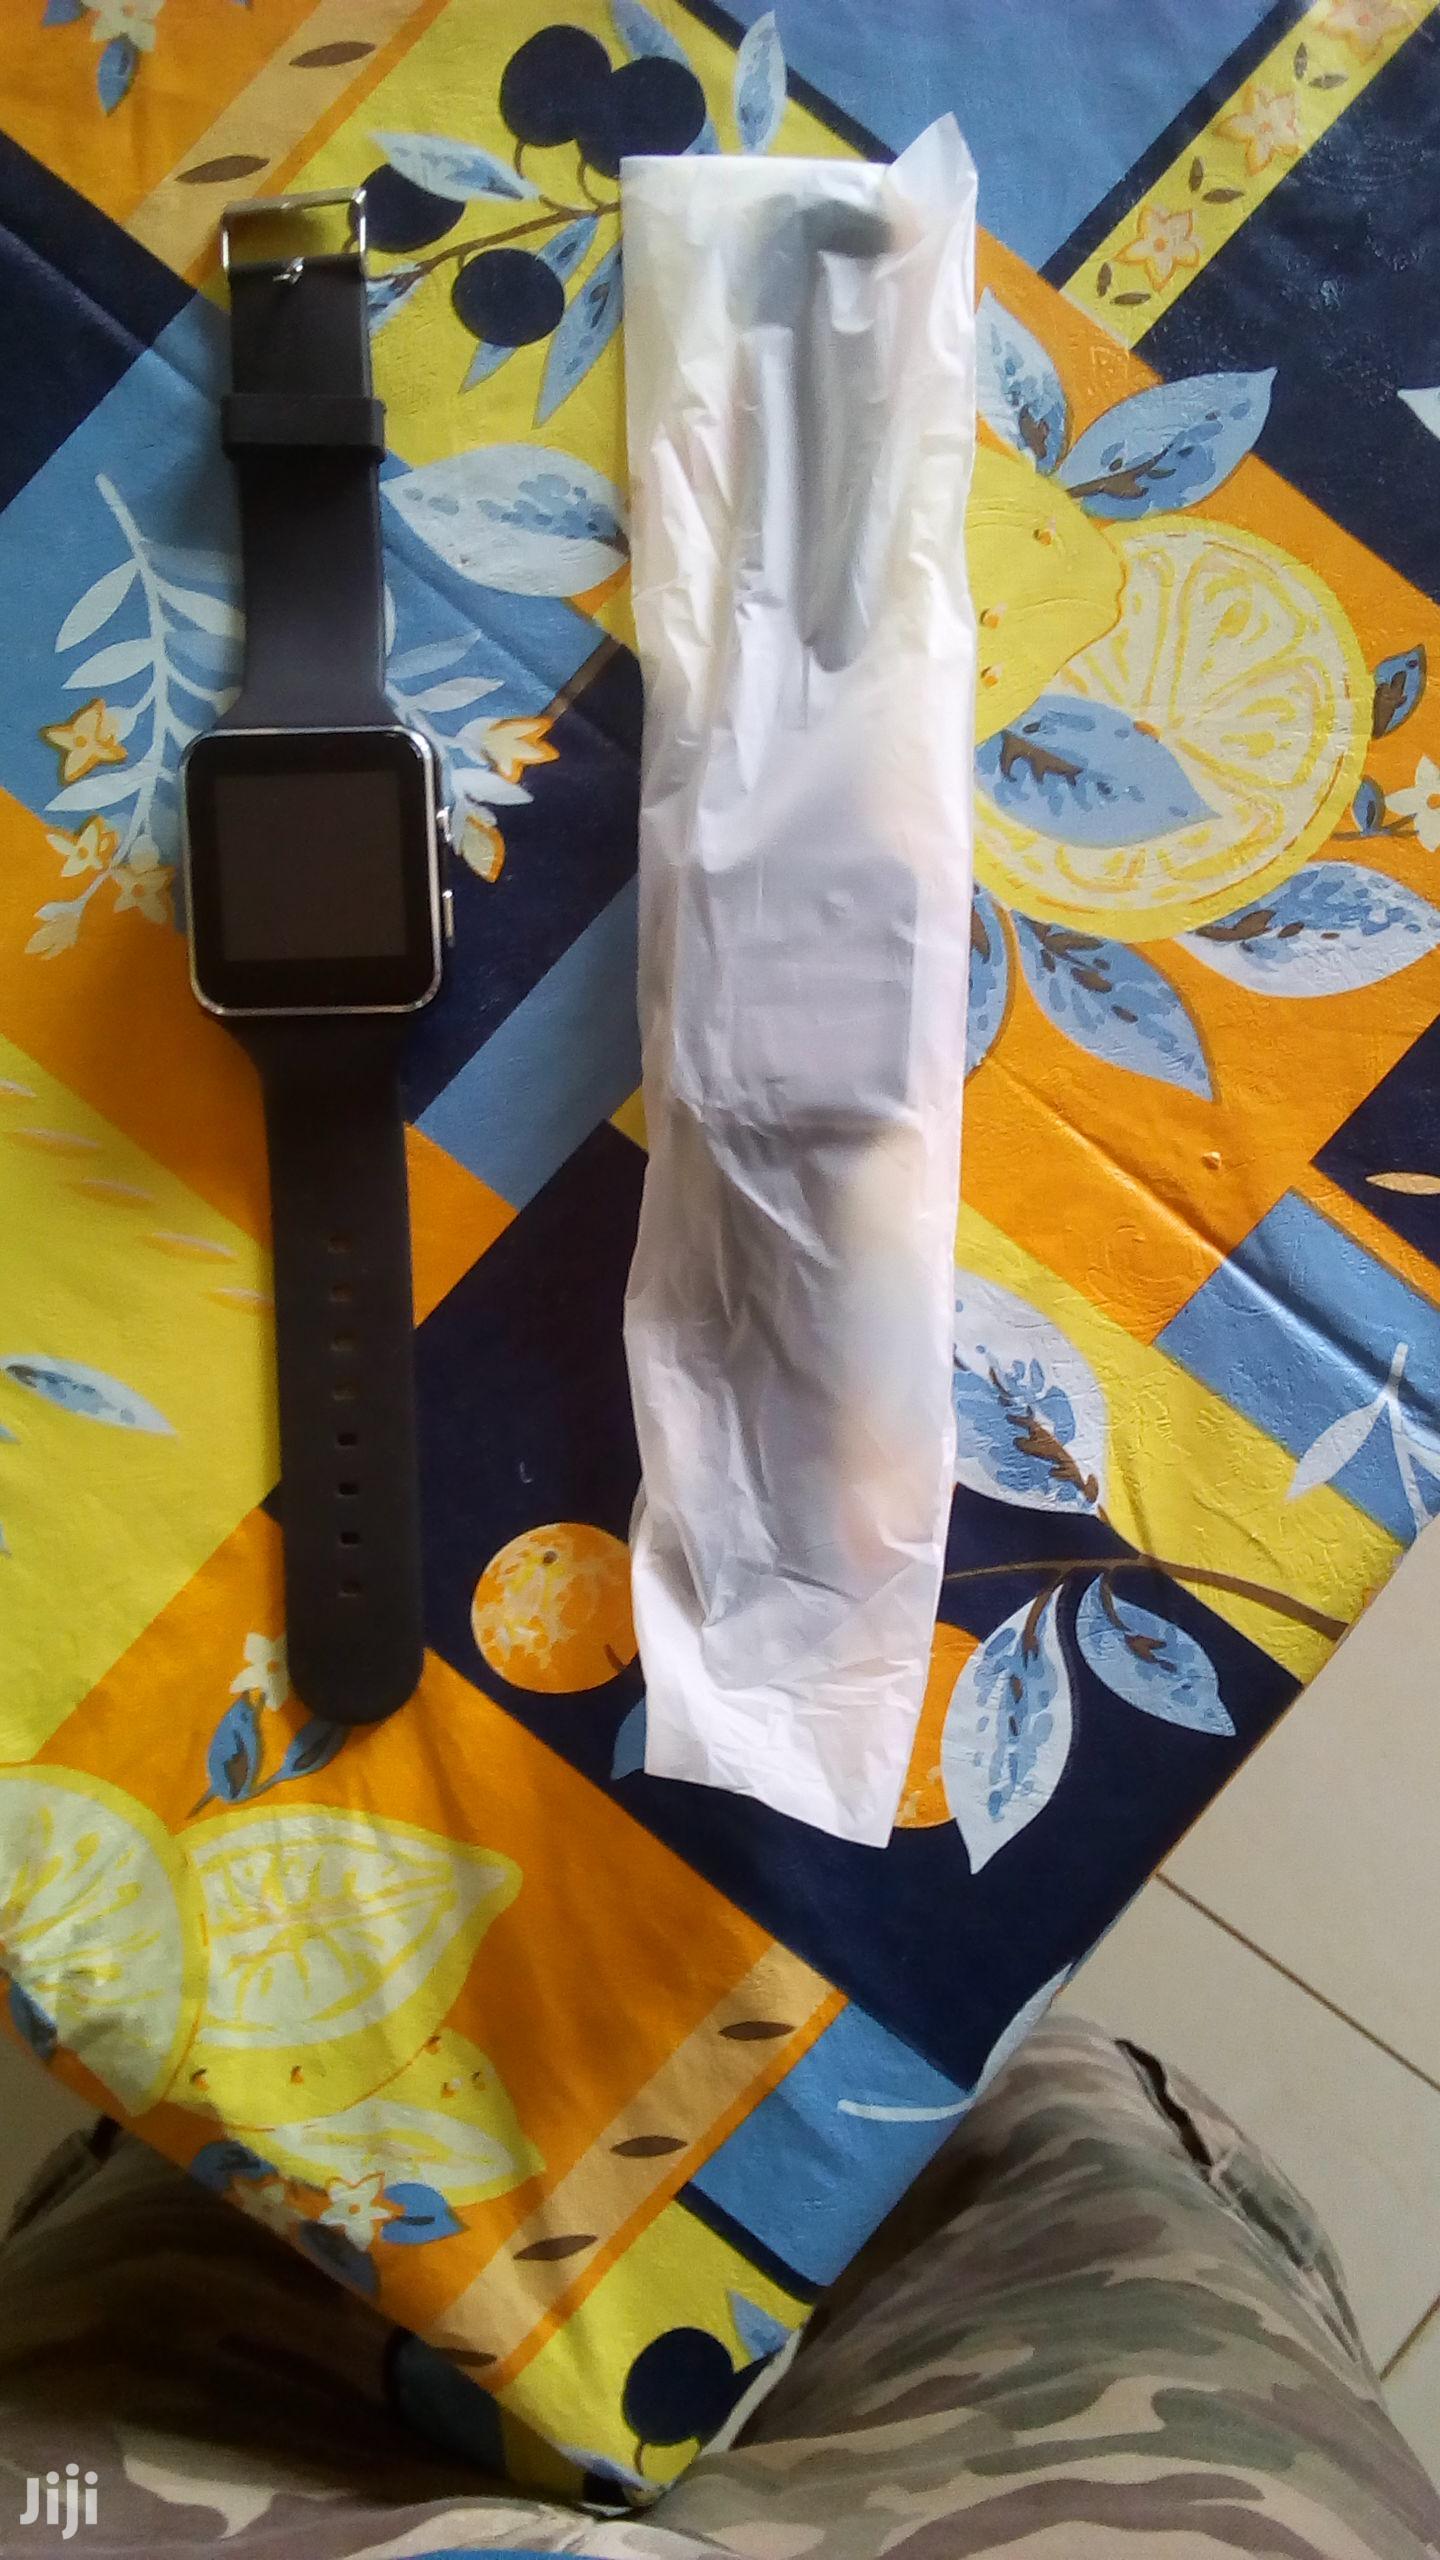 Archive: A Smart Watch